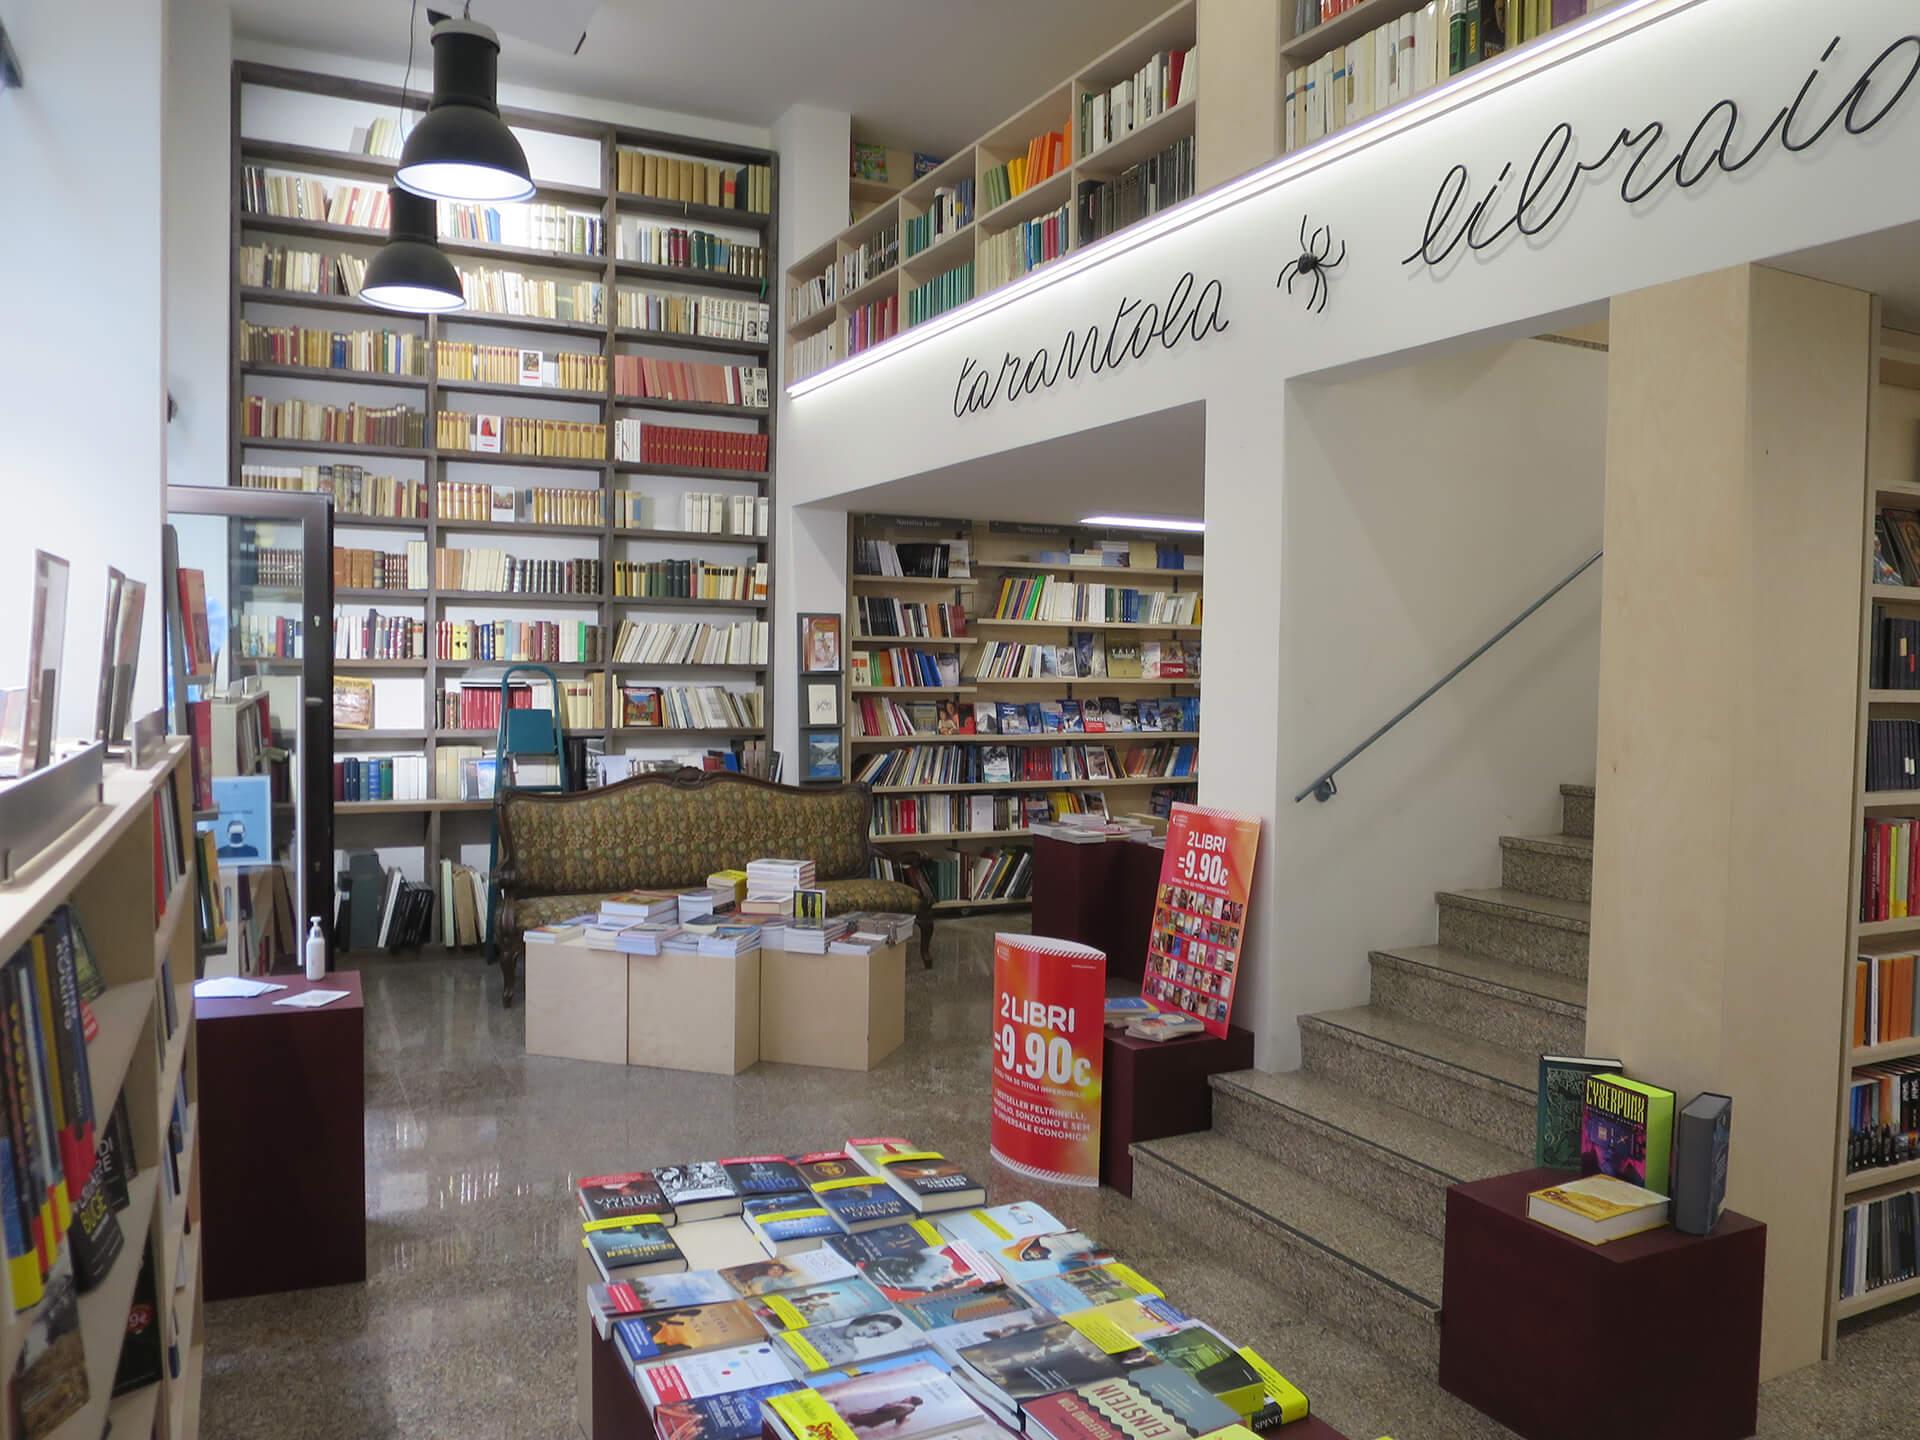 Libreria Tarantola